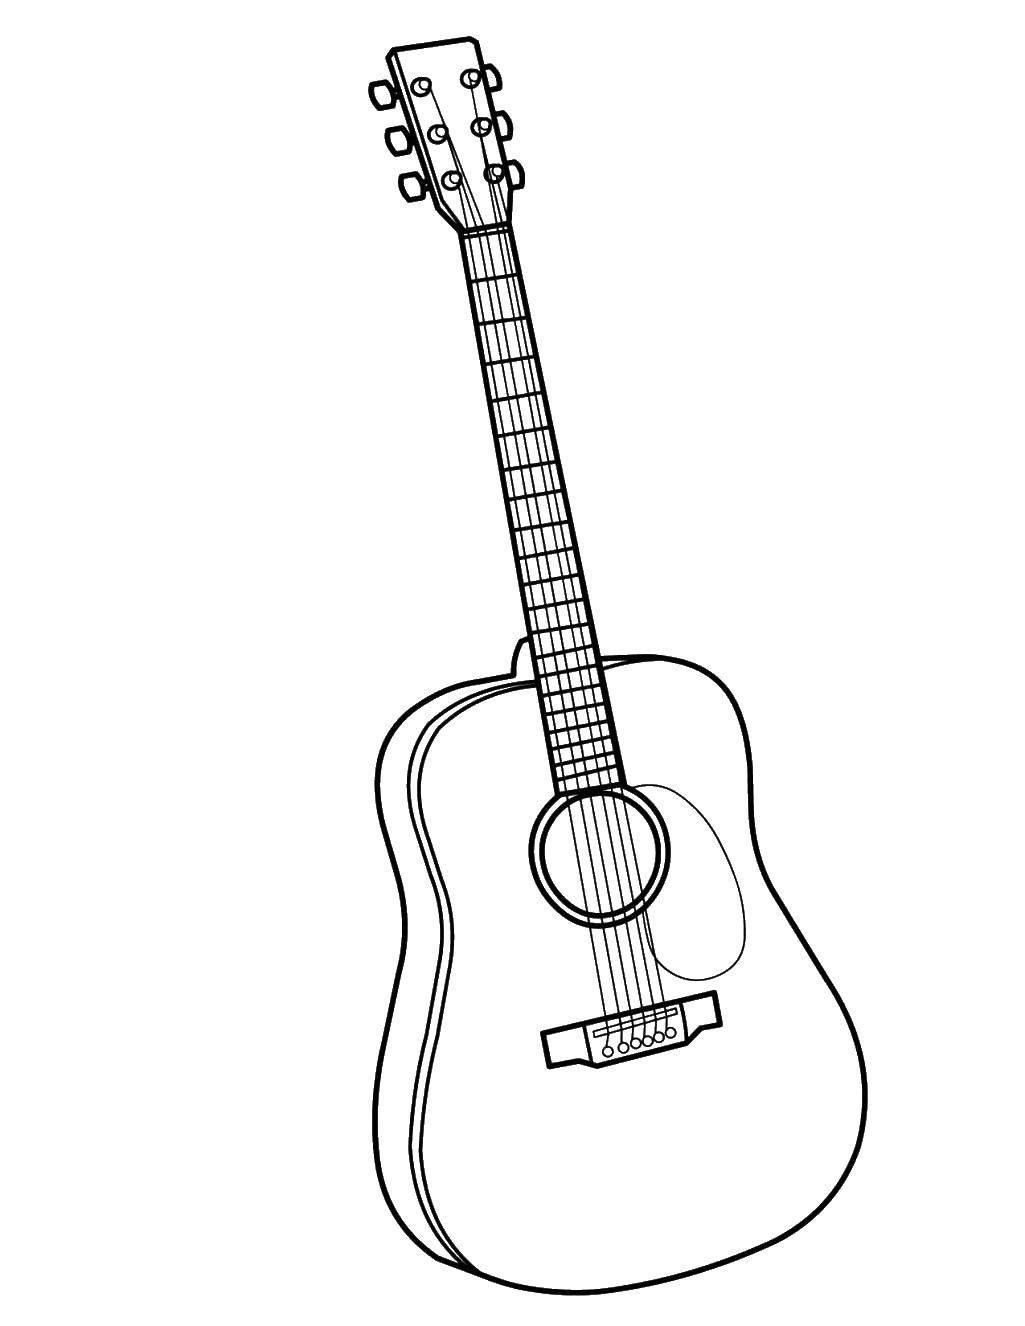 Coloring sheet music Download .  Print